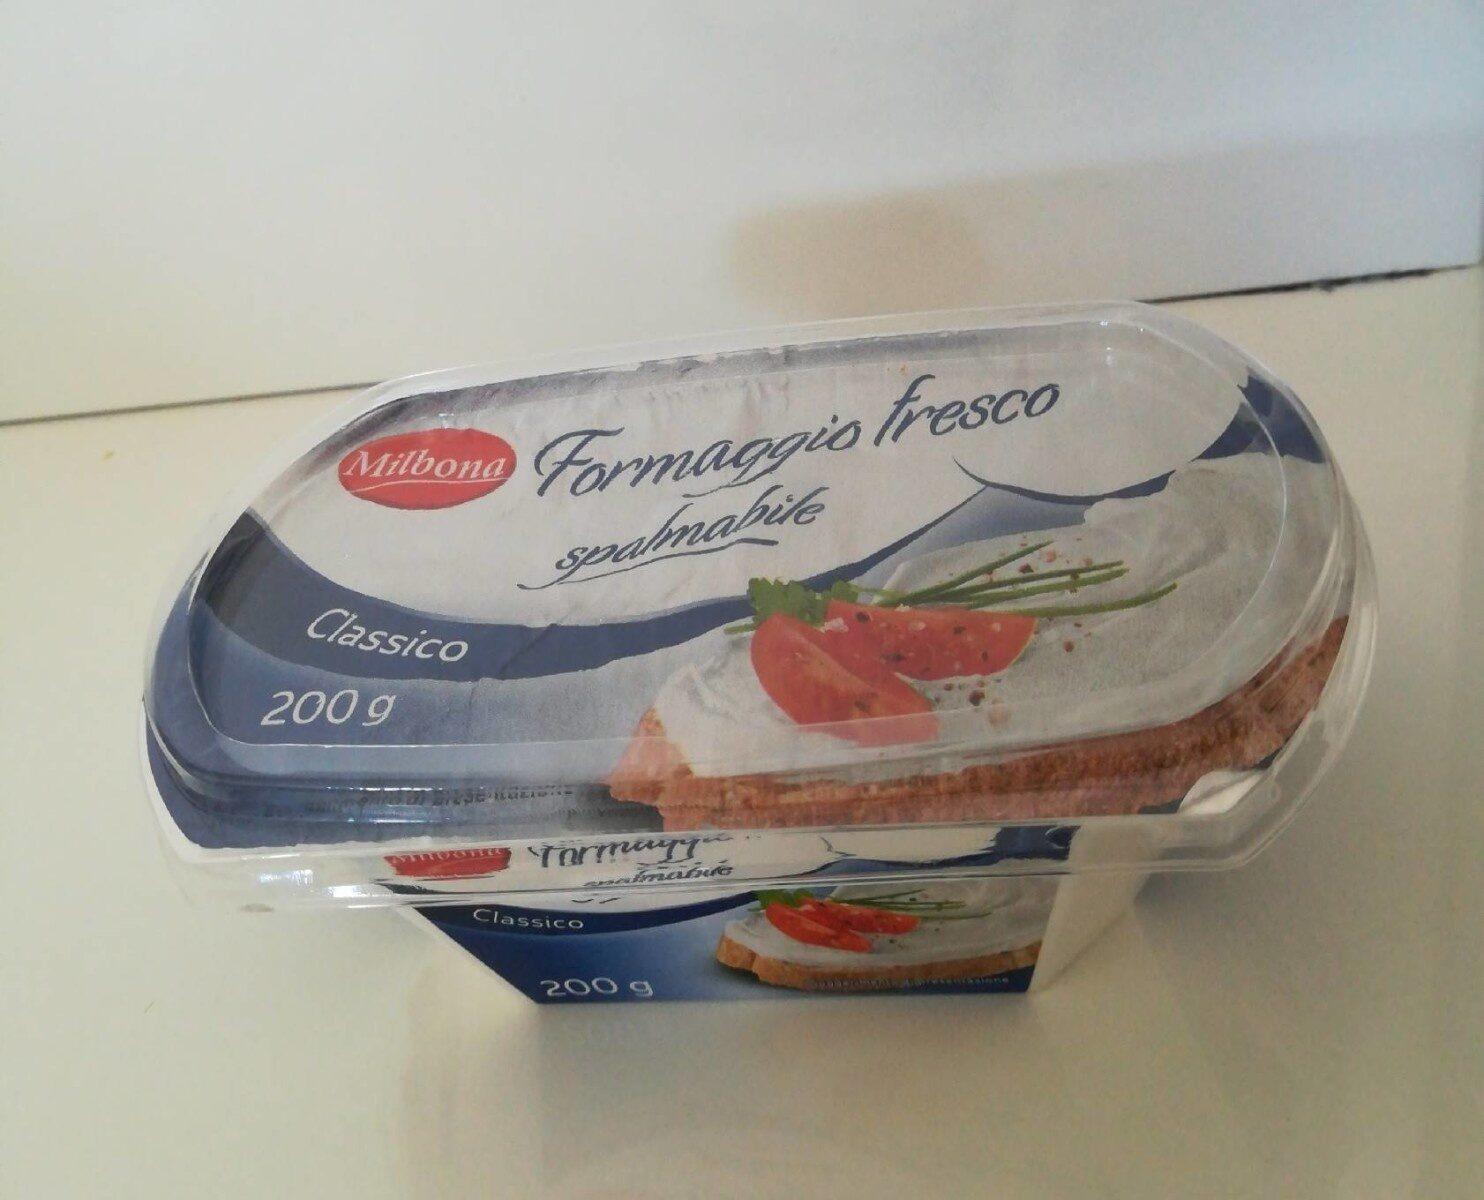 Formaggio fresco spalmabite classico - Produkt - en